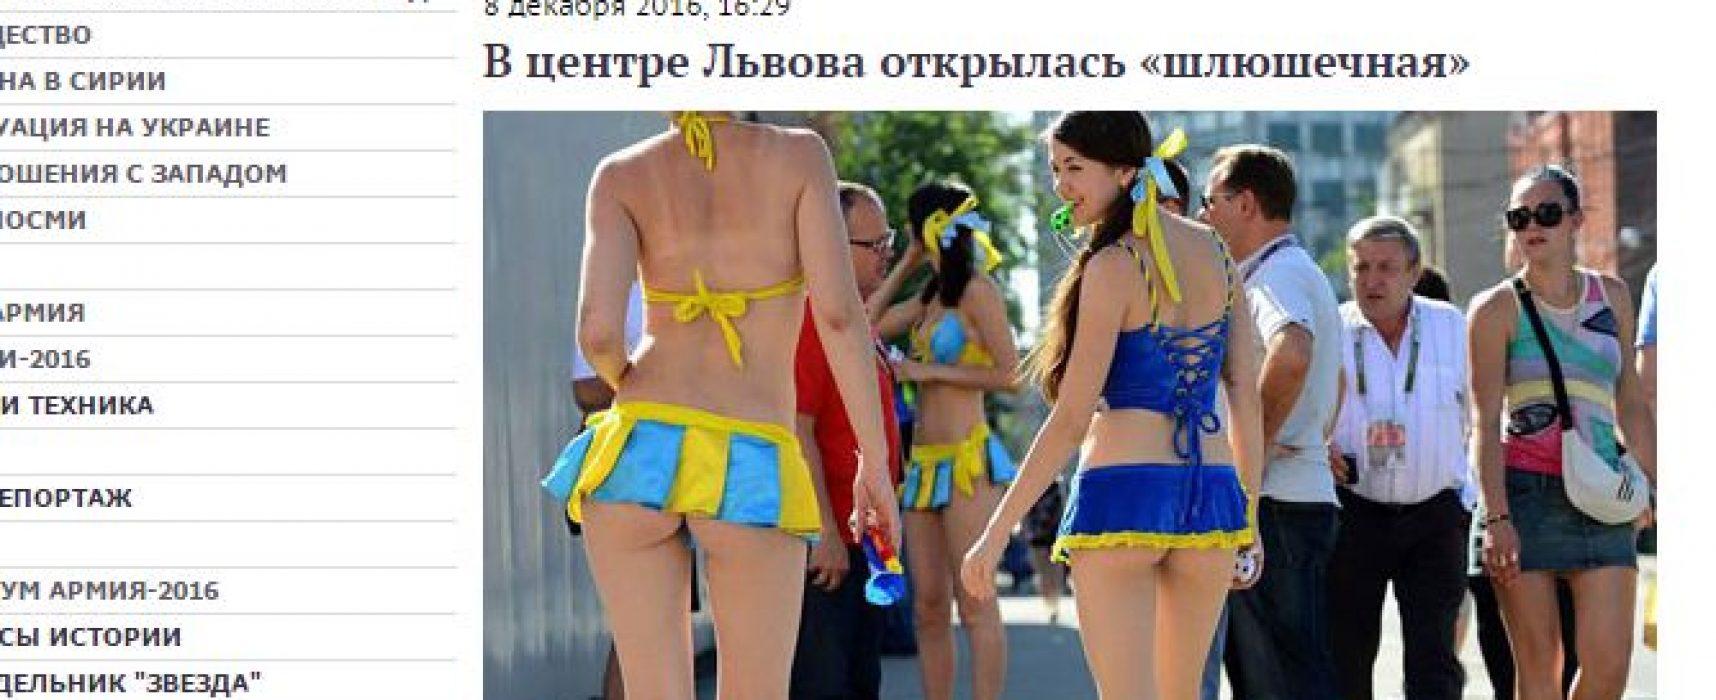 "Fake: ""Slettencafé"" geopend in Lviv"